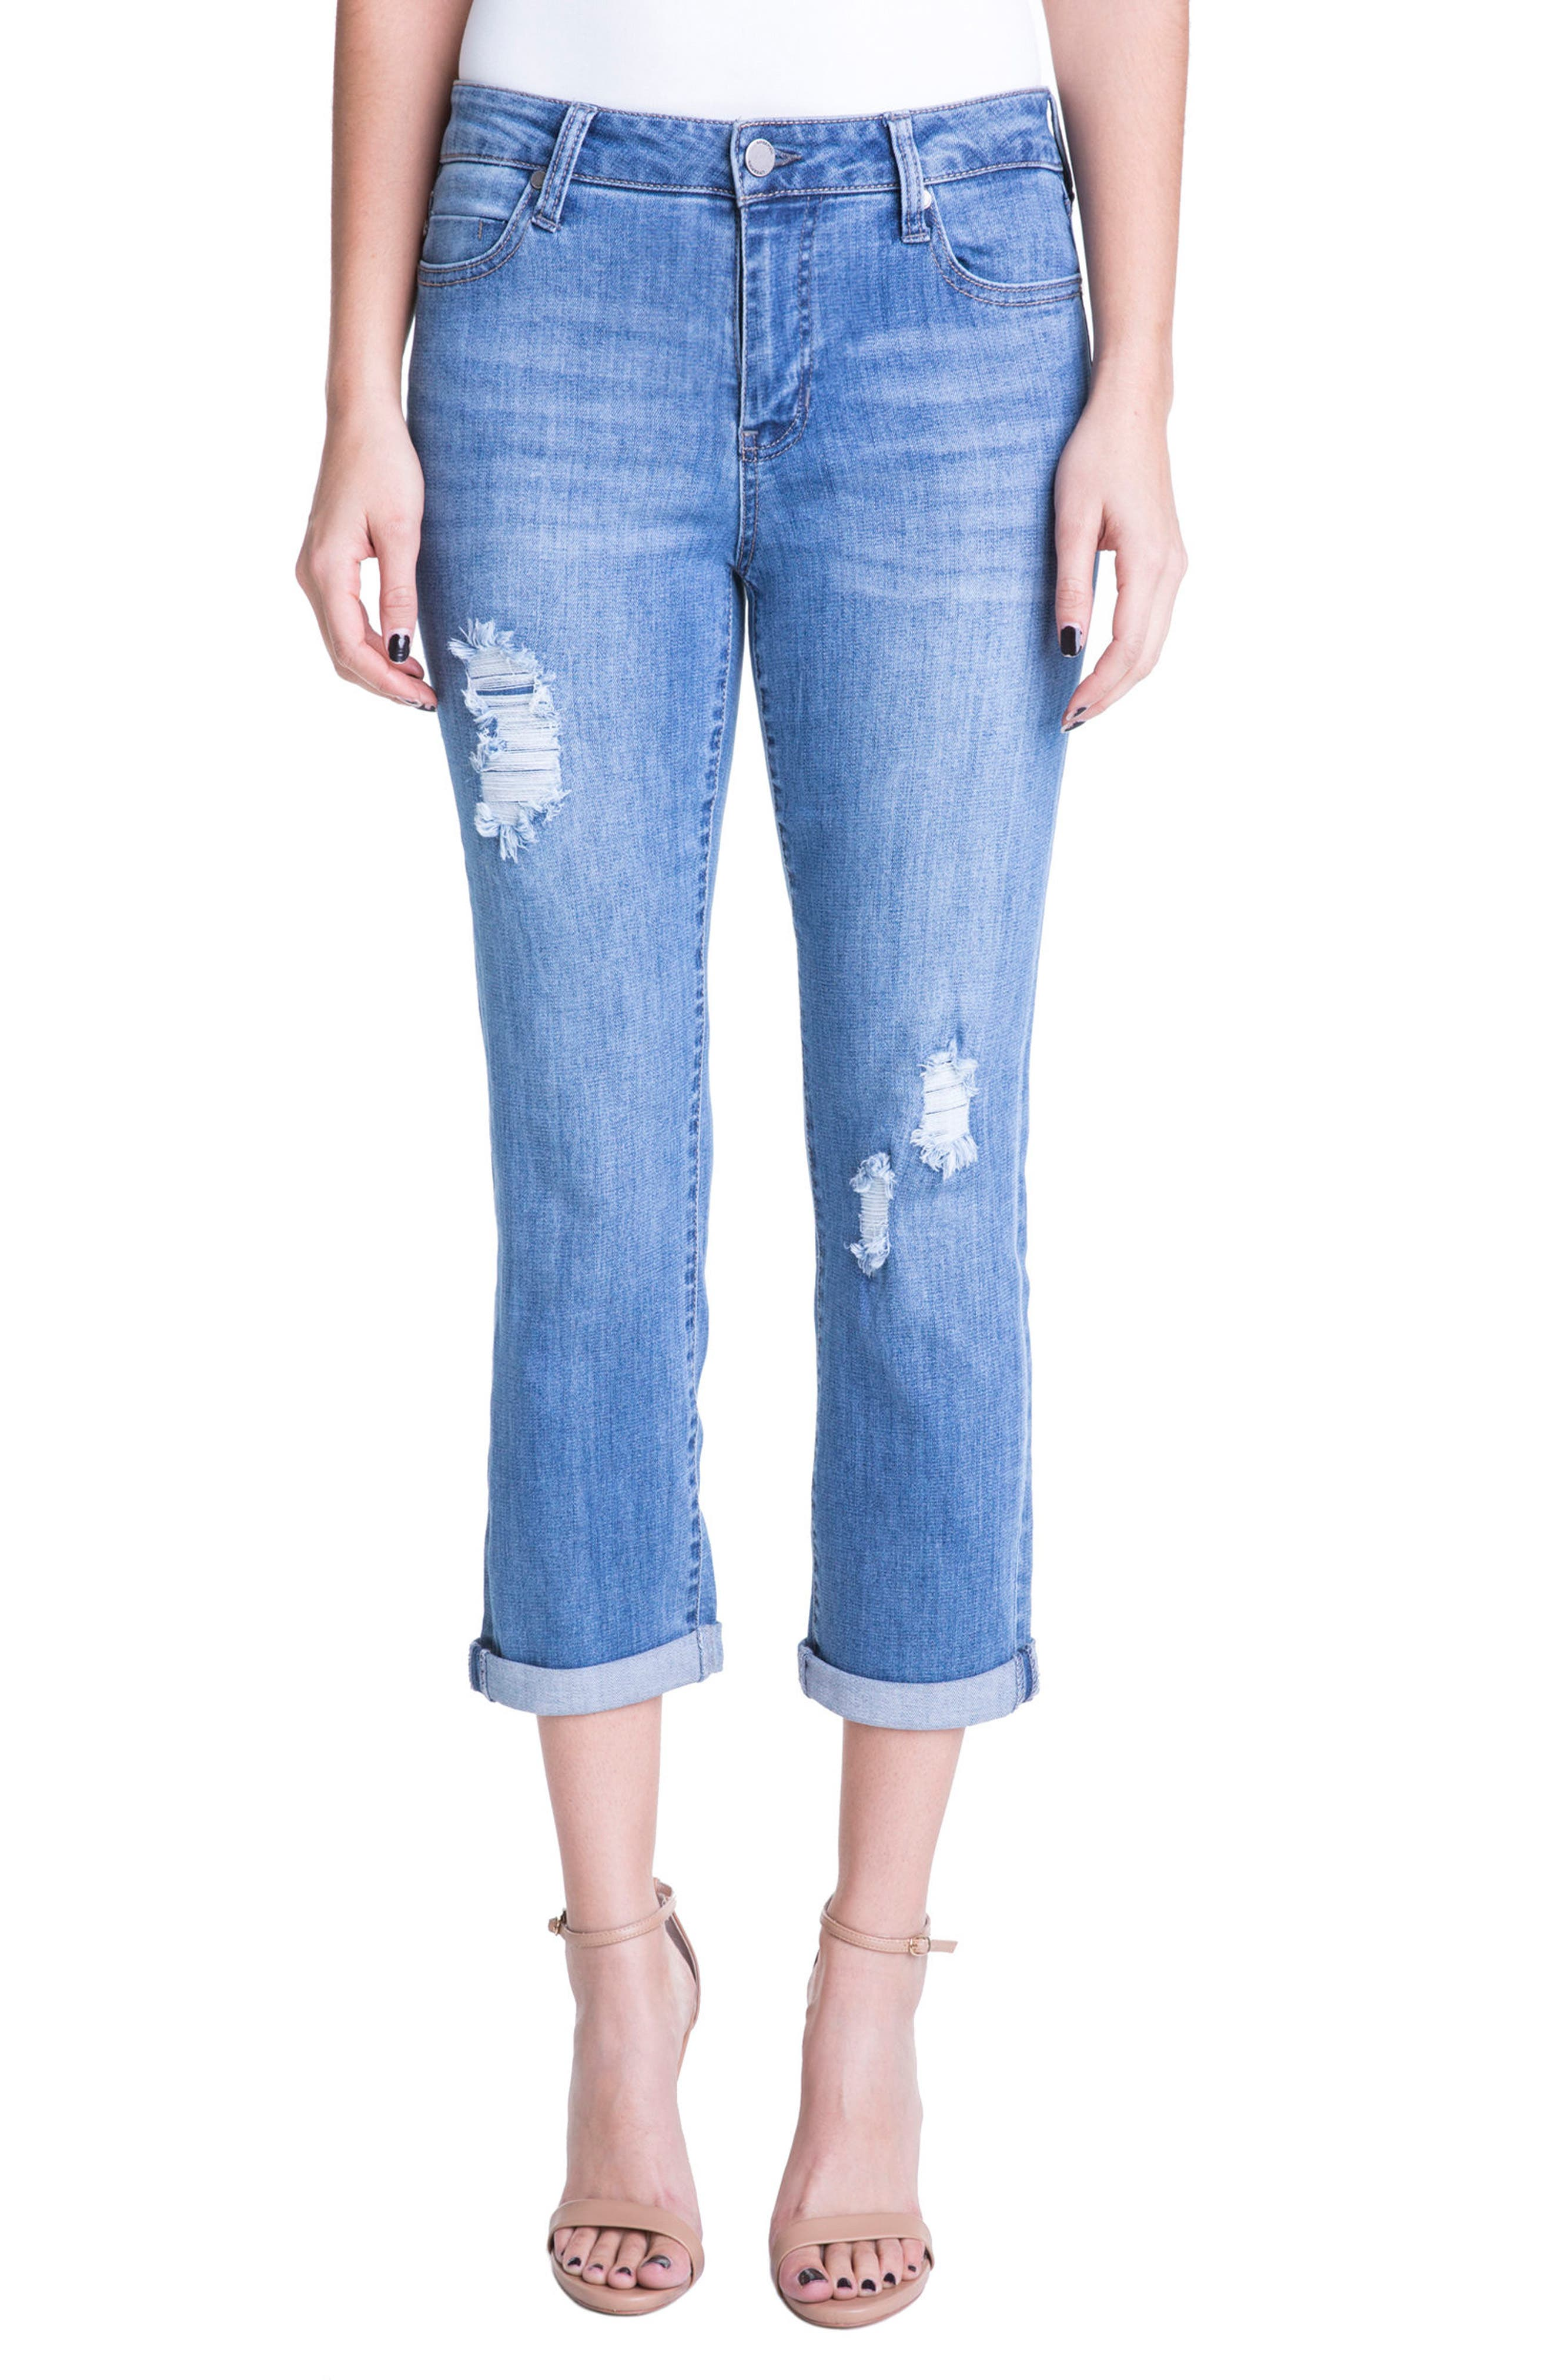 Michelle Distressed Cuff Capri Jeans,                         Main,                         color, Melbourne Light/ Destruction